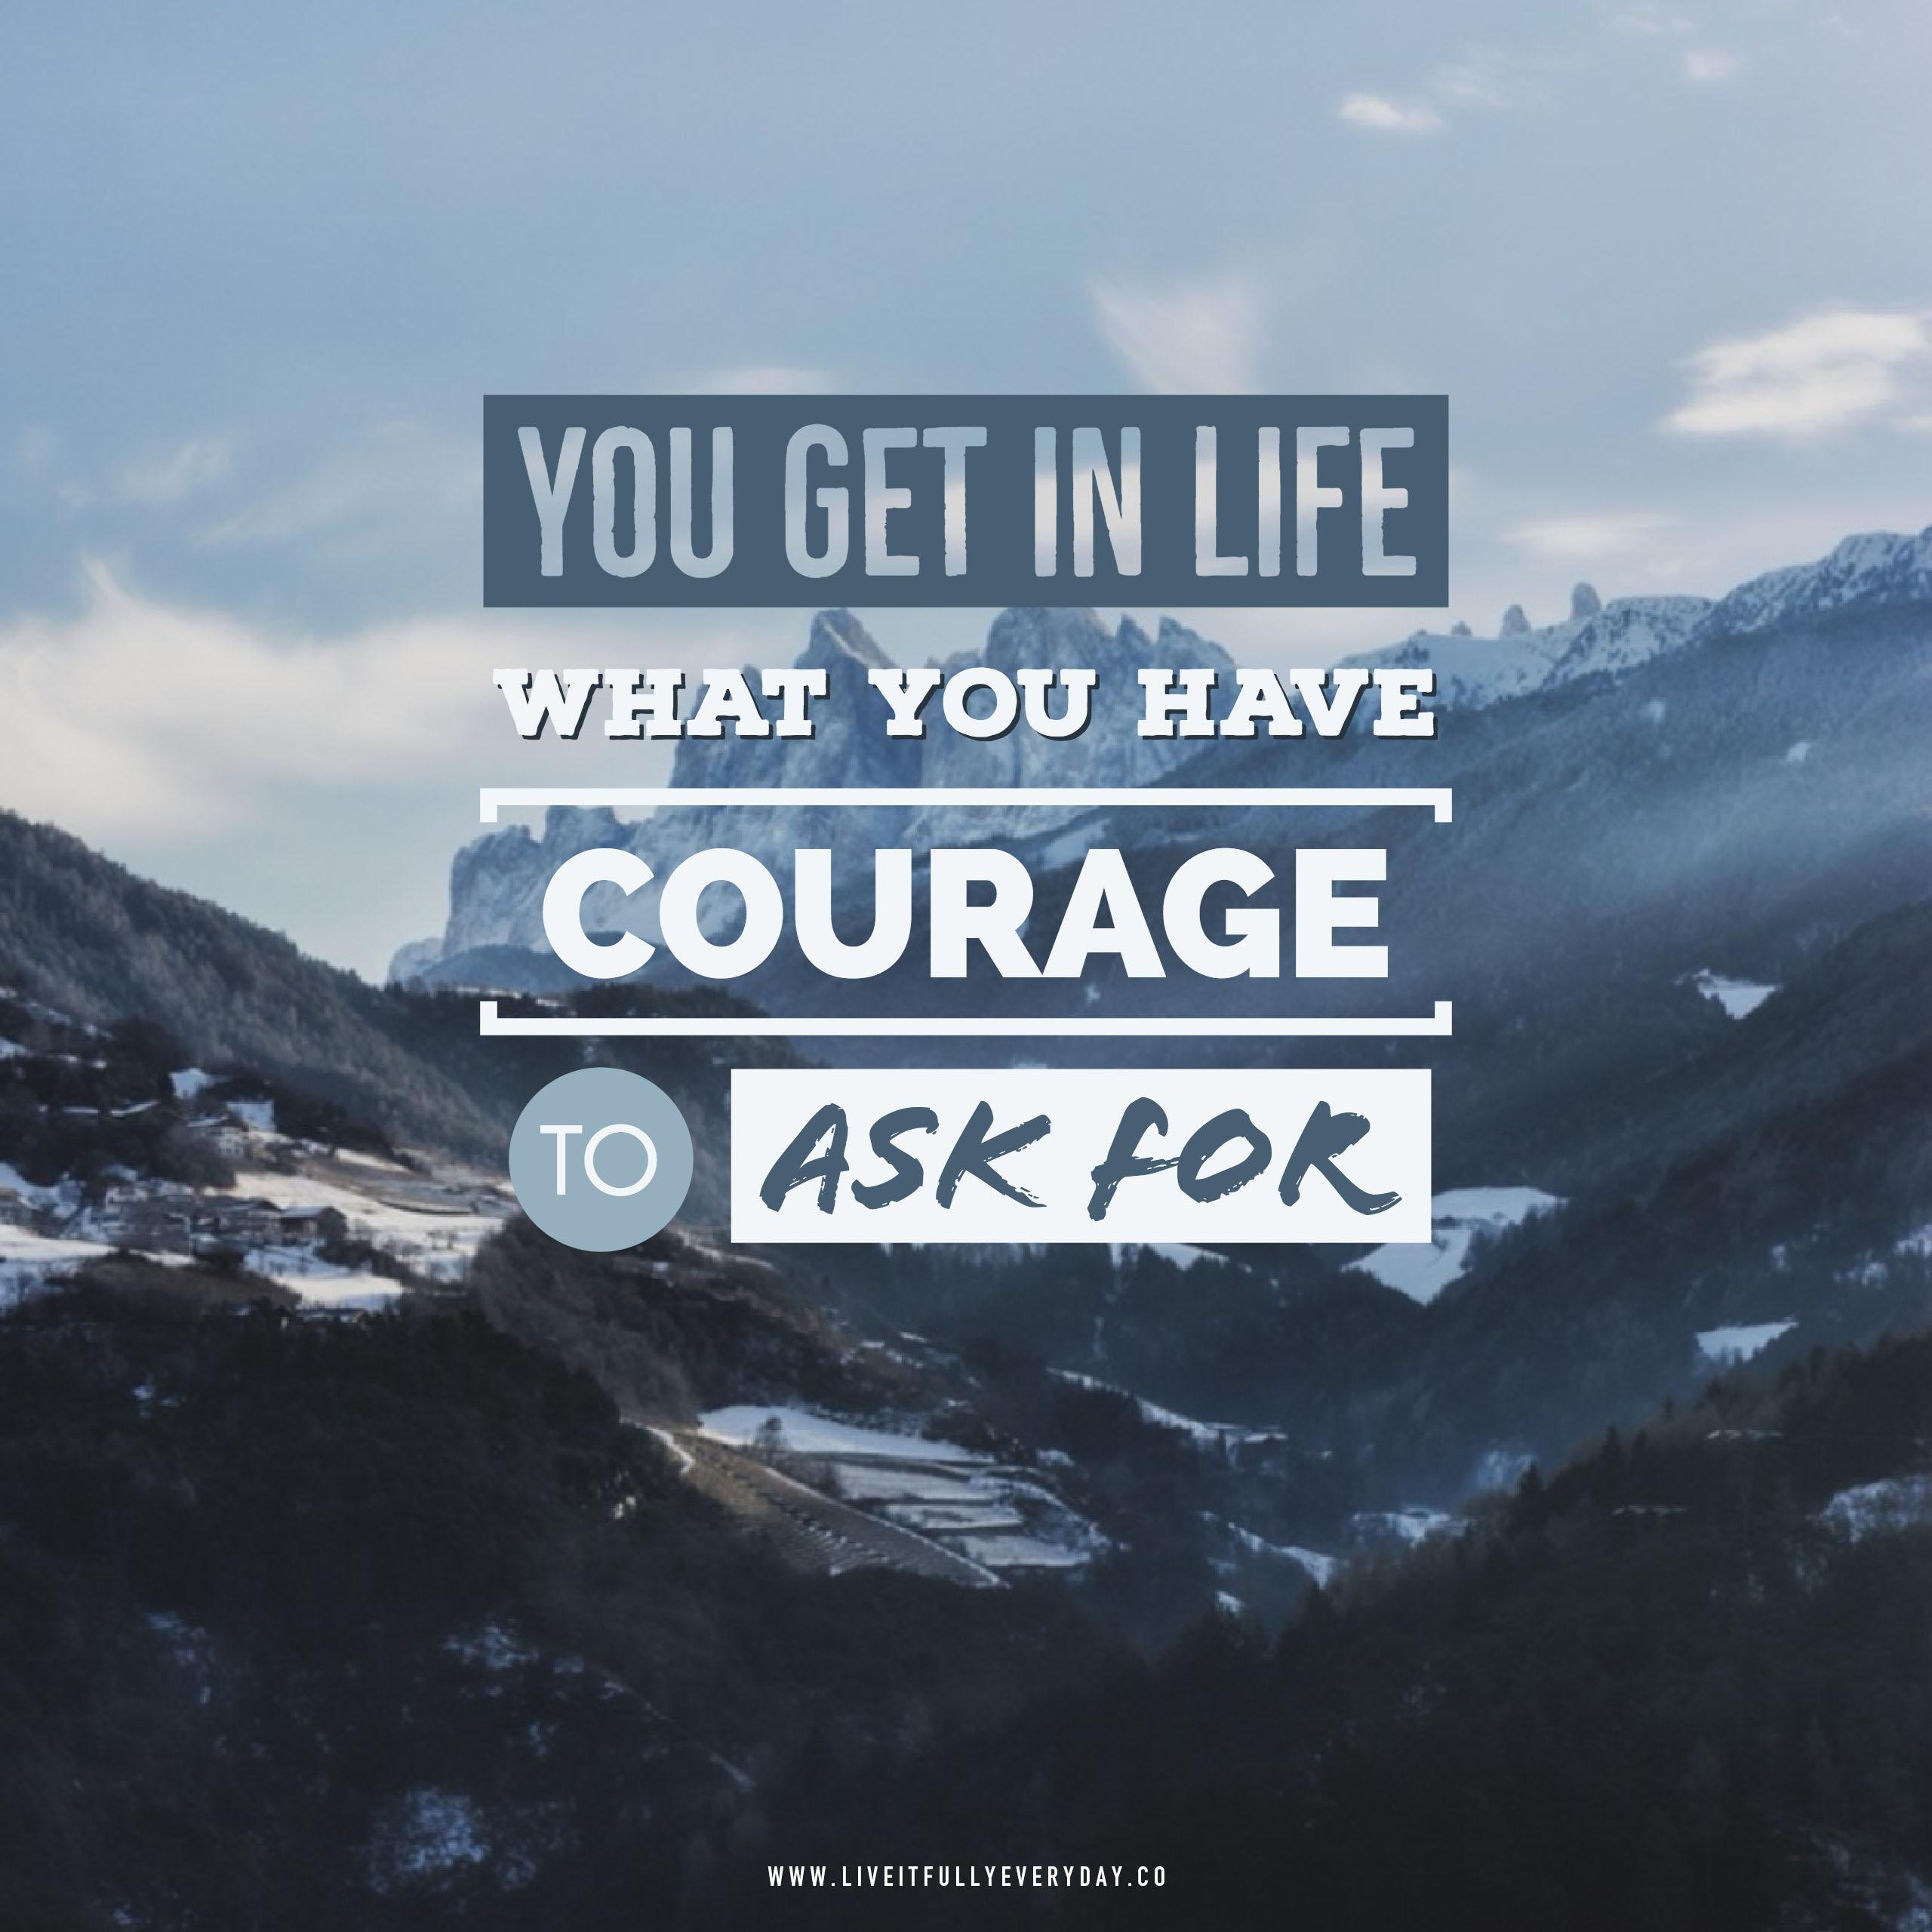 WWW.LIVEITFULLYEVERYDAY.CO https://inspirational.ly